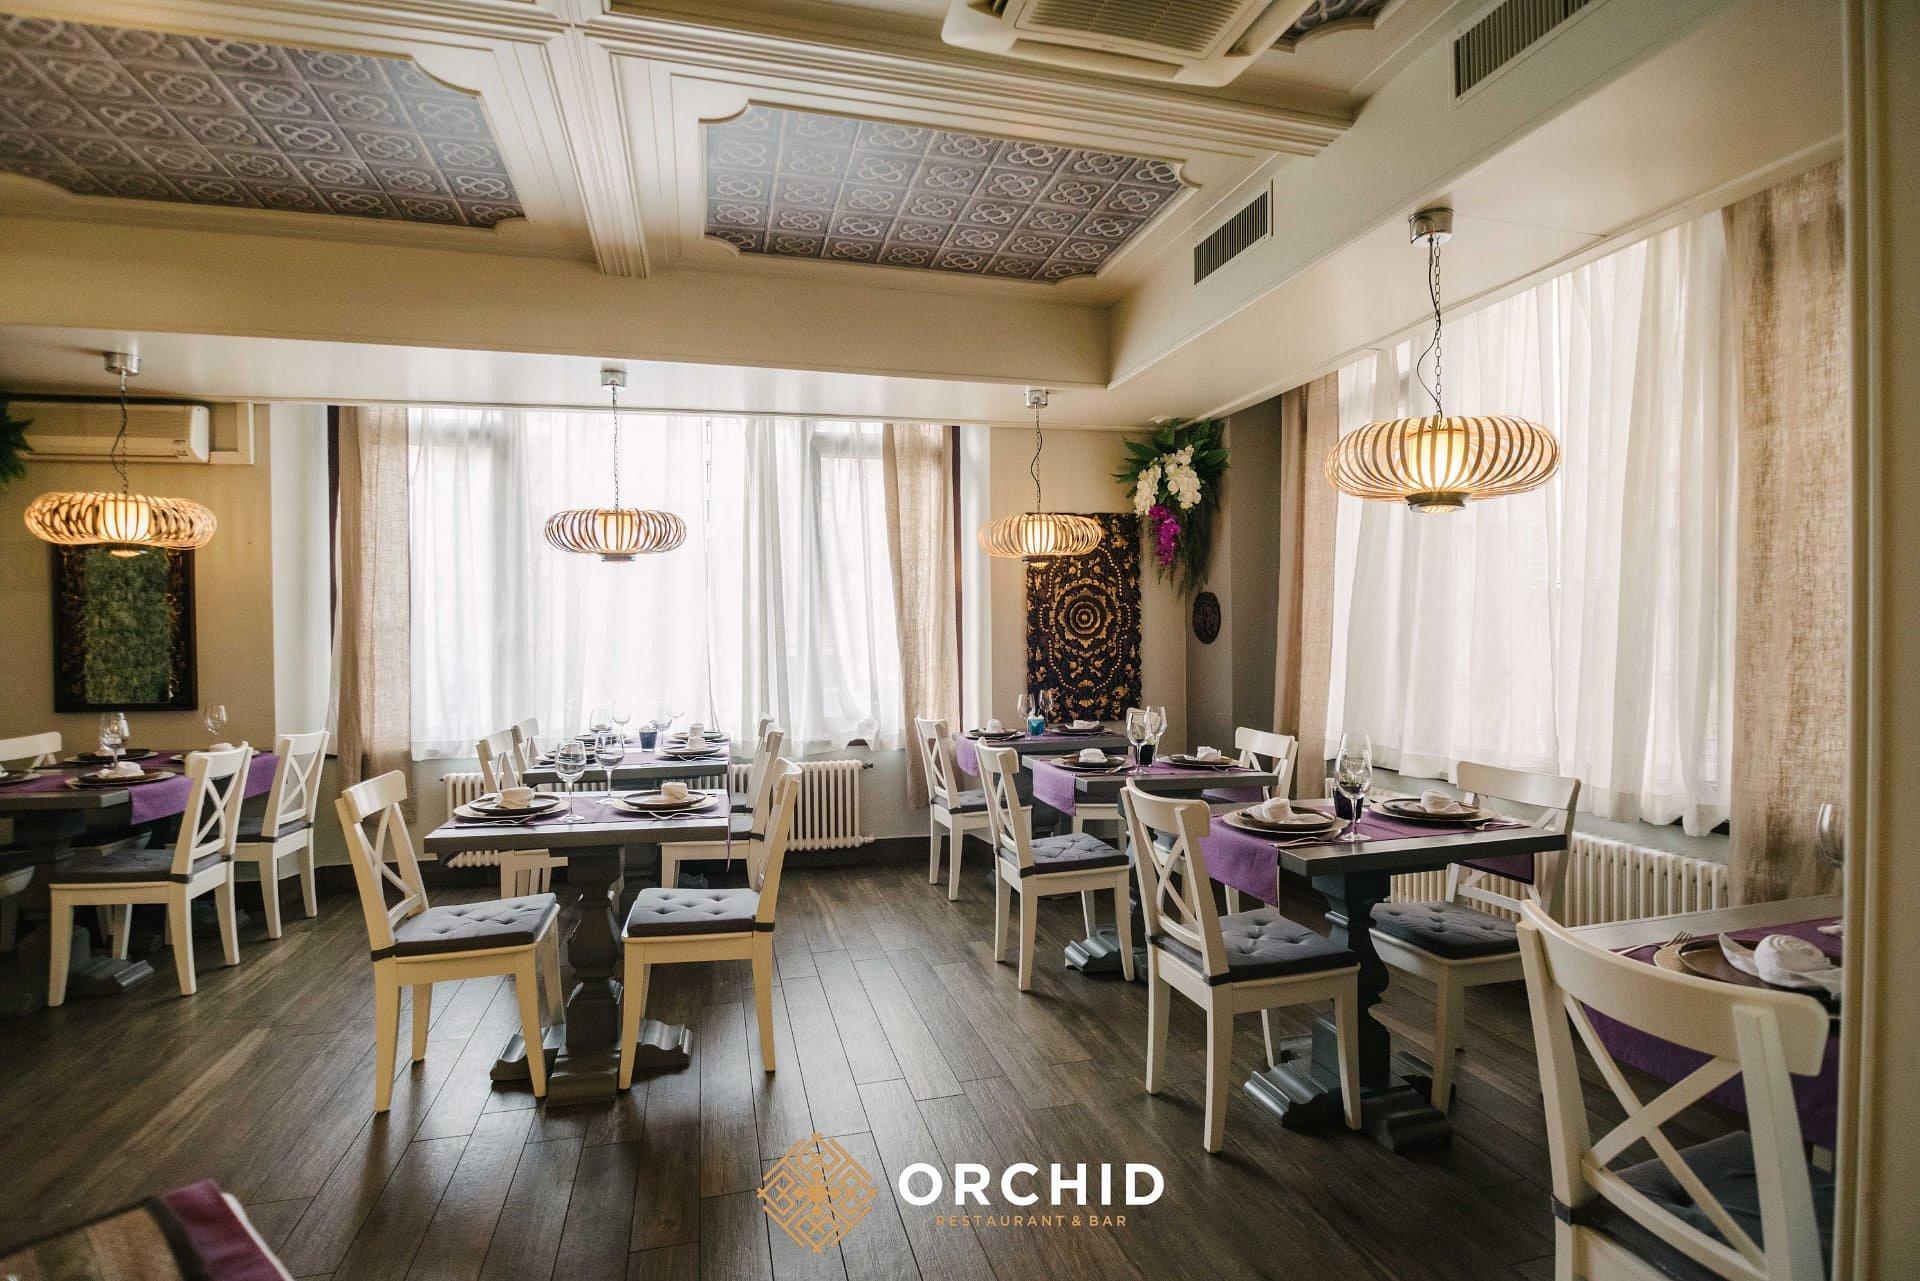 THAI ORCHID Restaurant & Bar